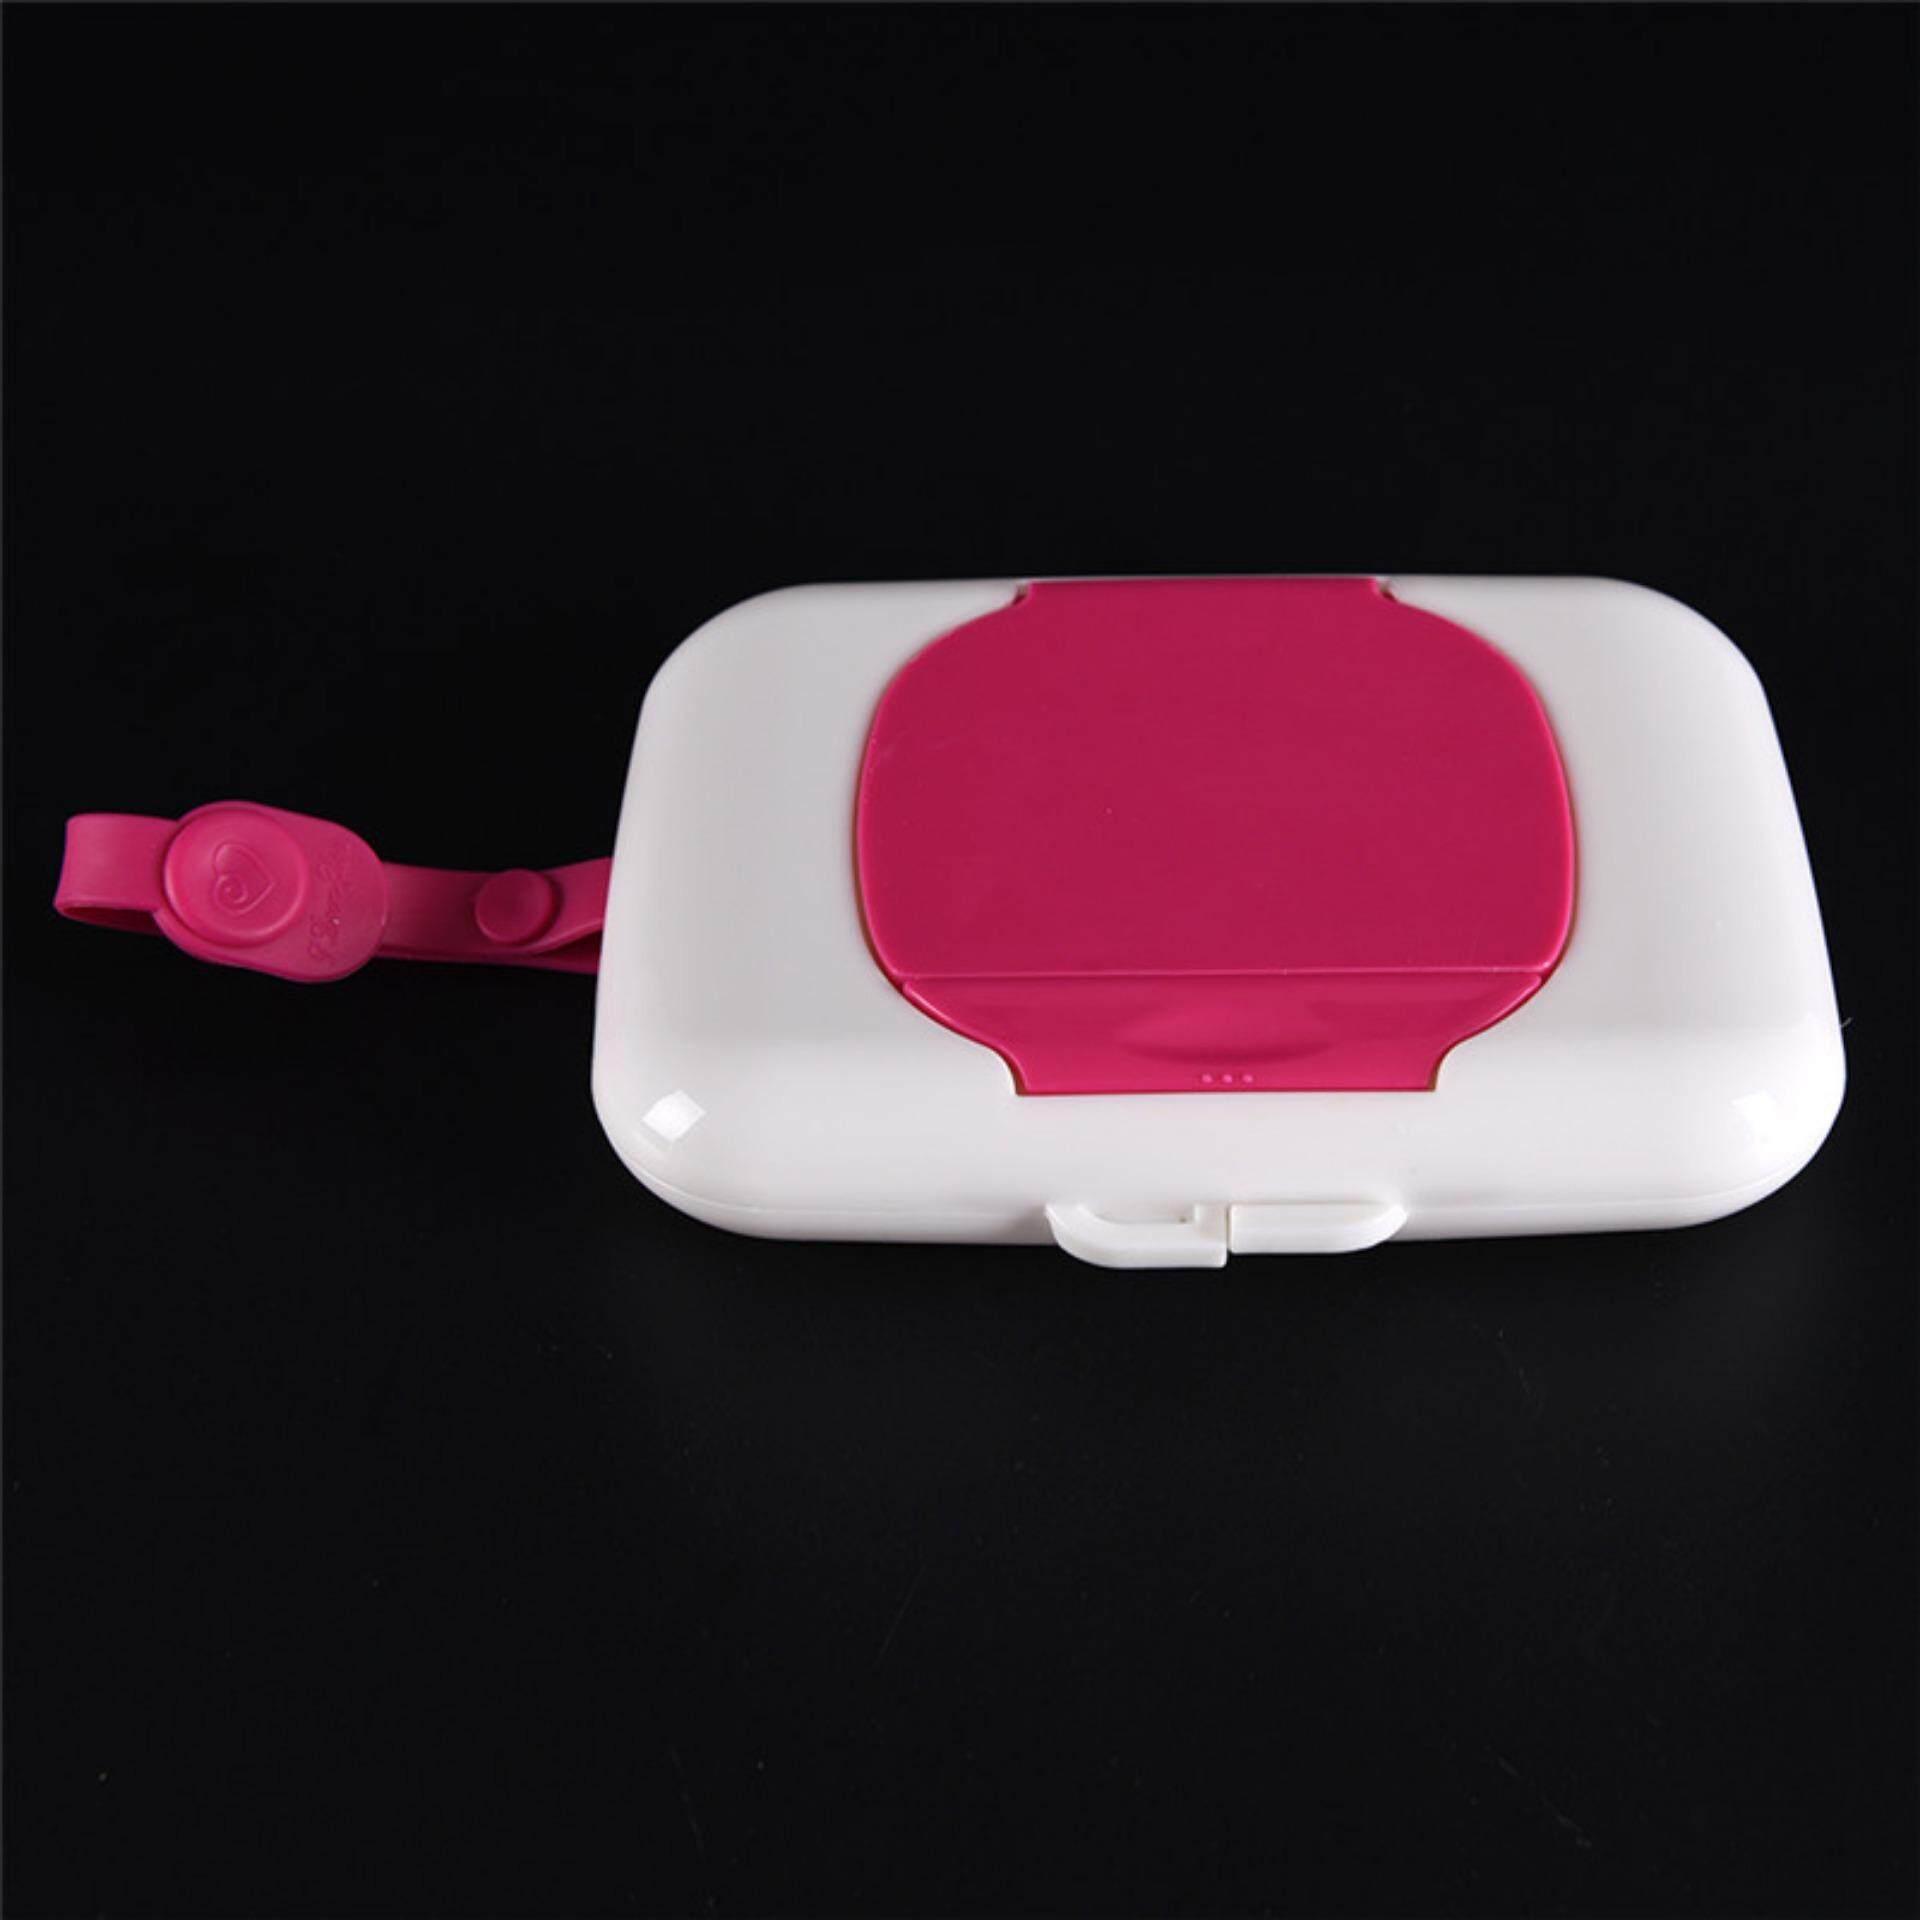 Baby Travel Wipe Case Child Wet Wipes Box Changing Dispenser Storage Holder Pink - Intl By A Mango.